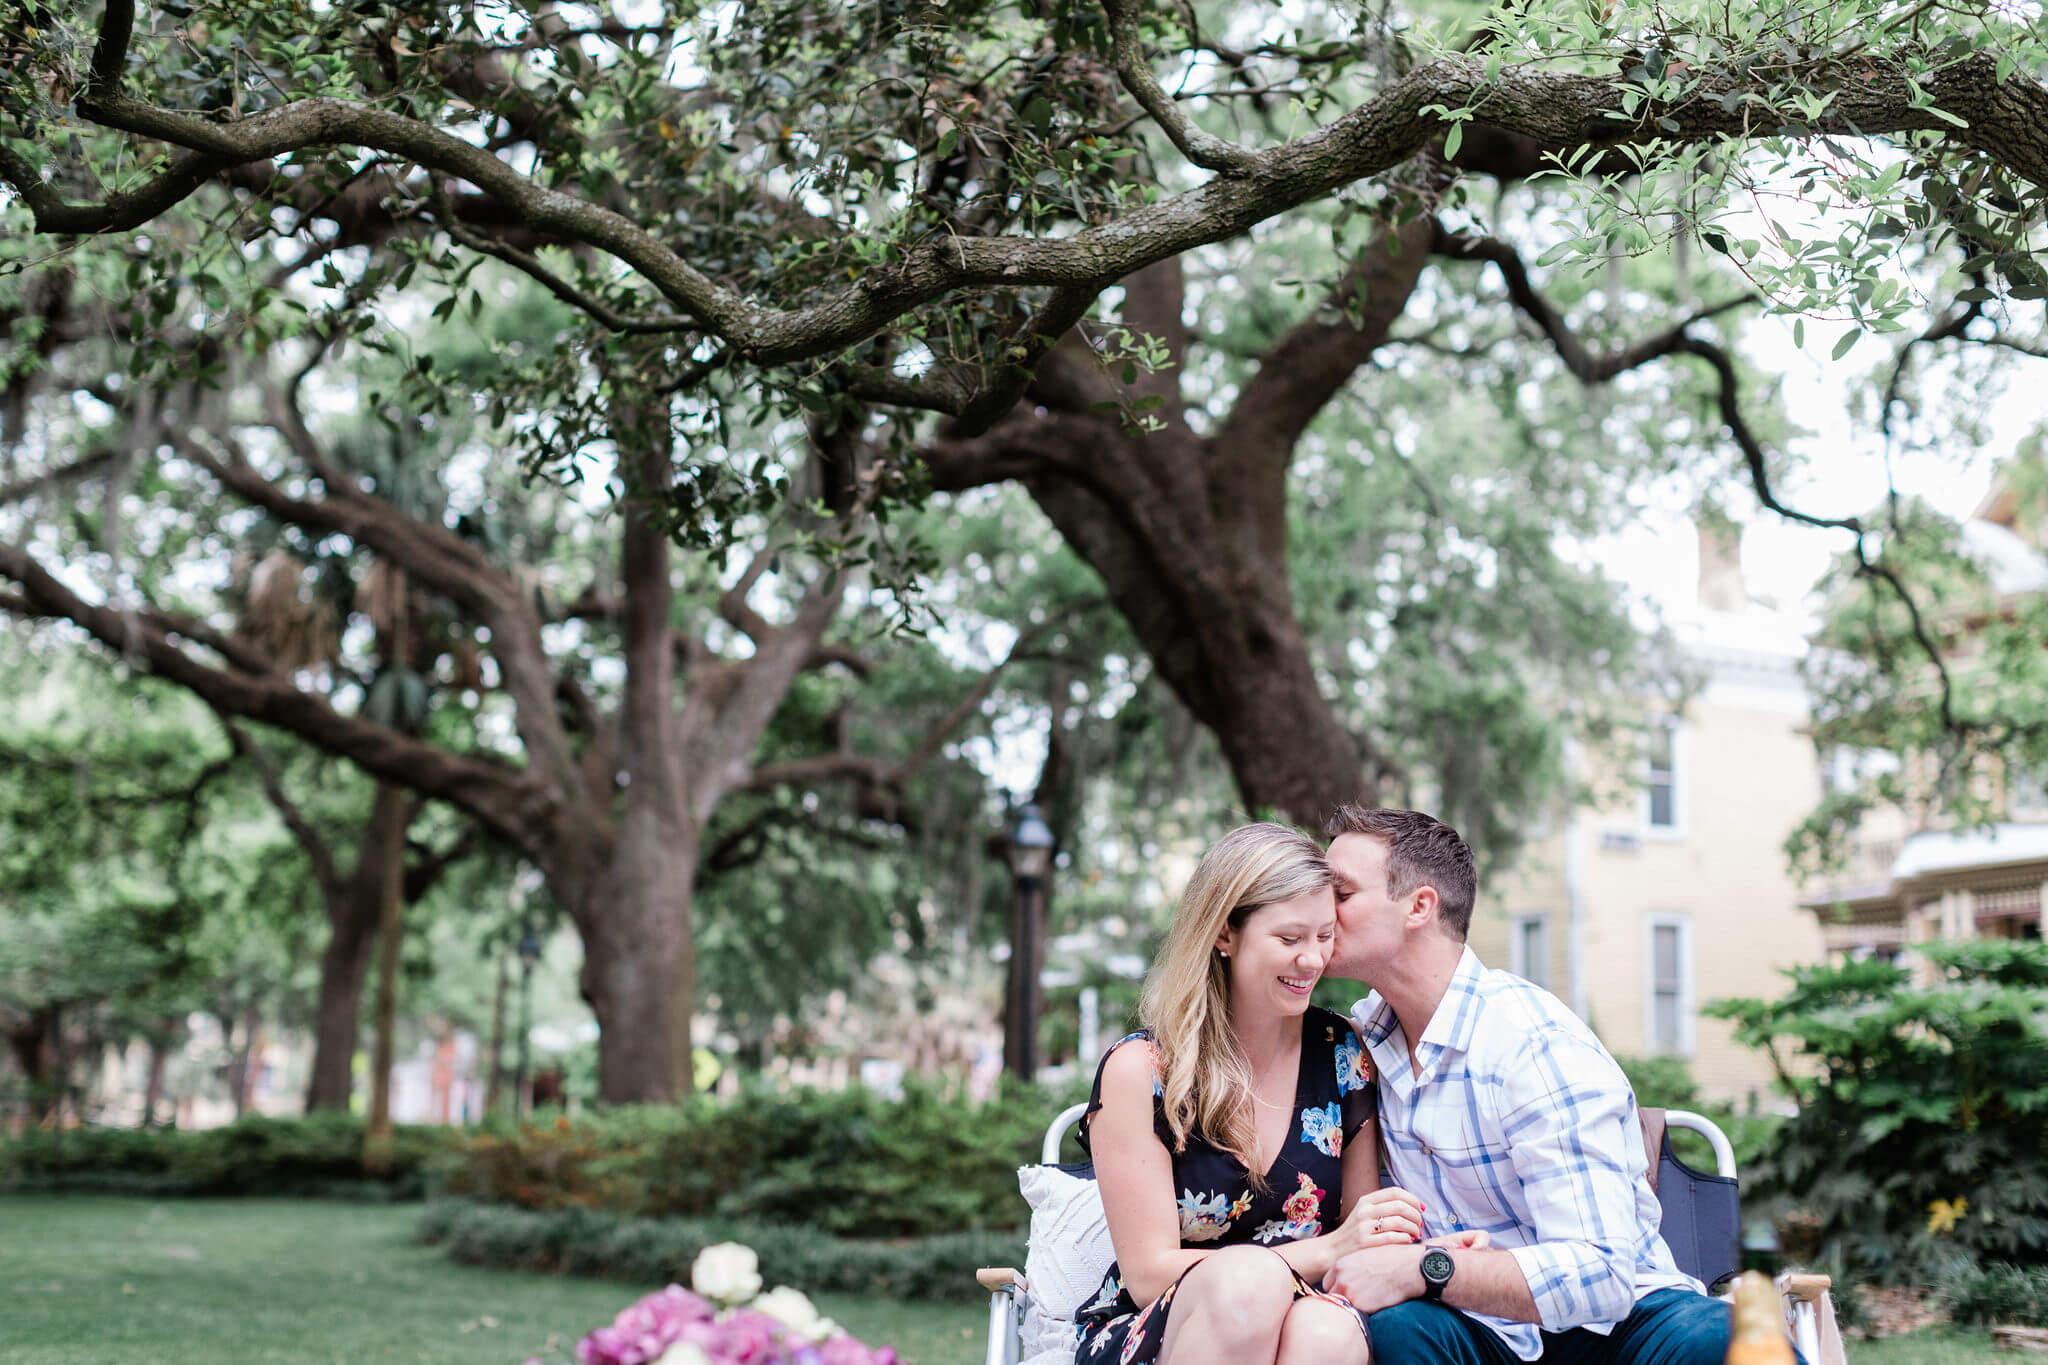 Apt-b-photography-savannah-proposal-photographer-savannah-wedding-forsyth-park-proposal06.jpg